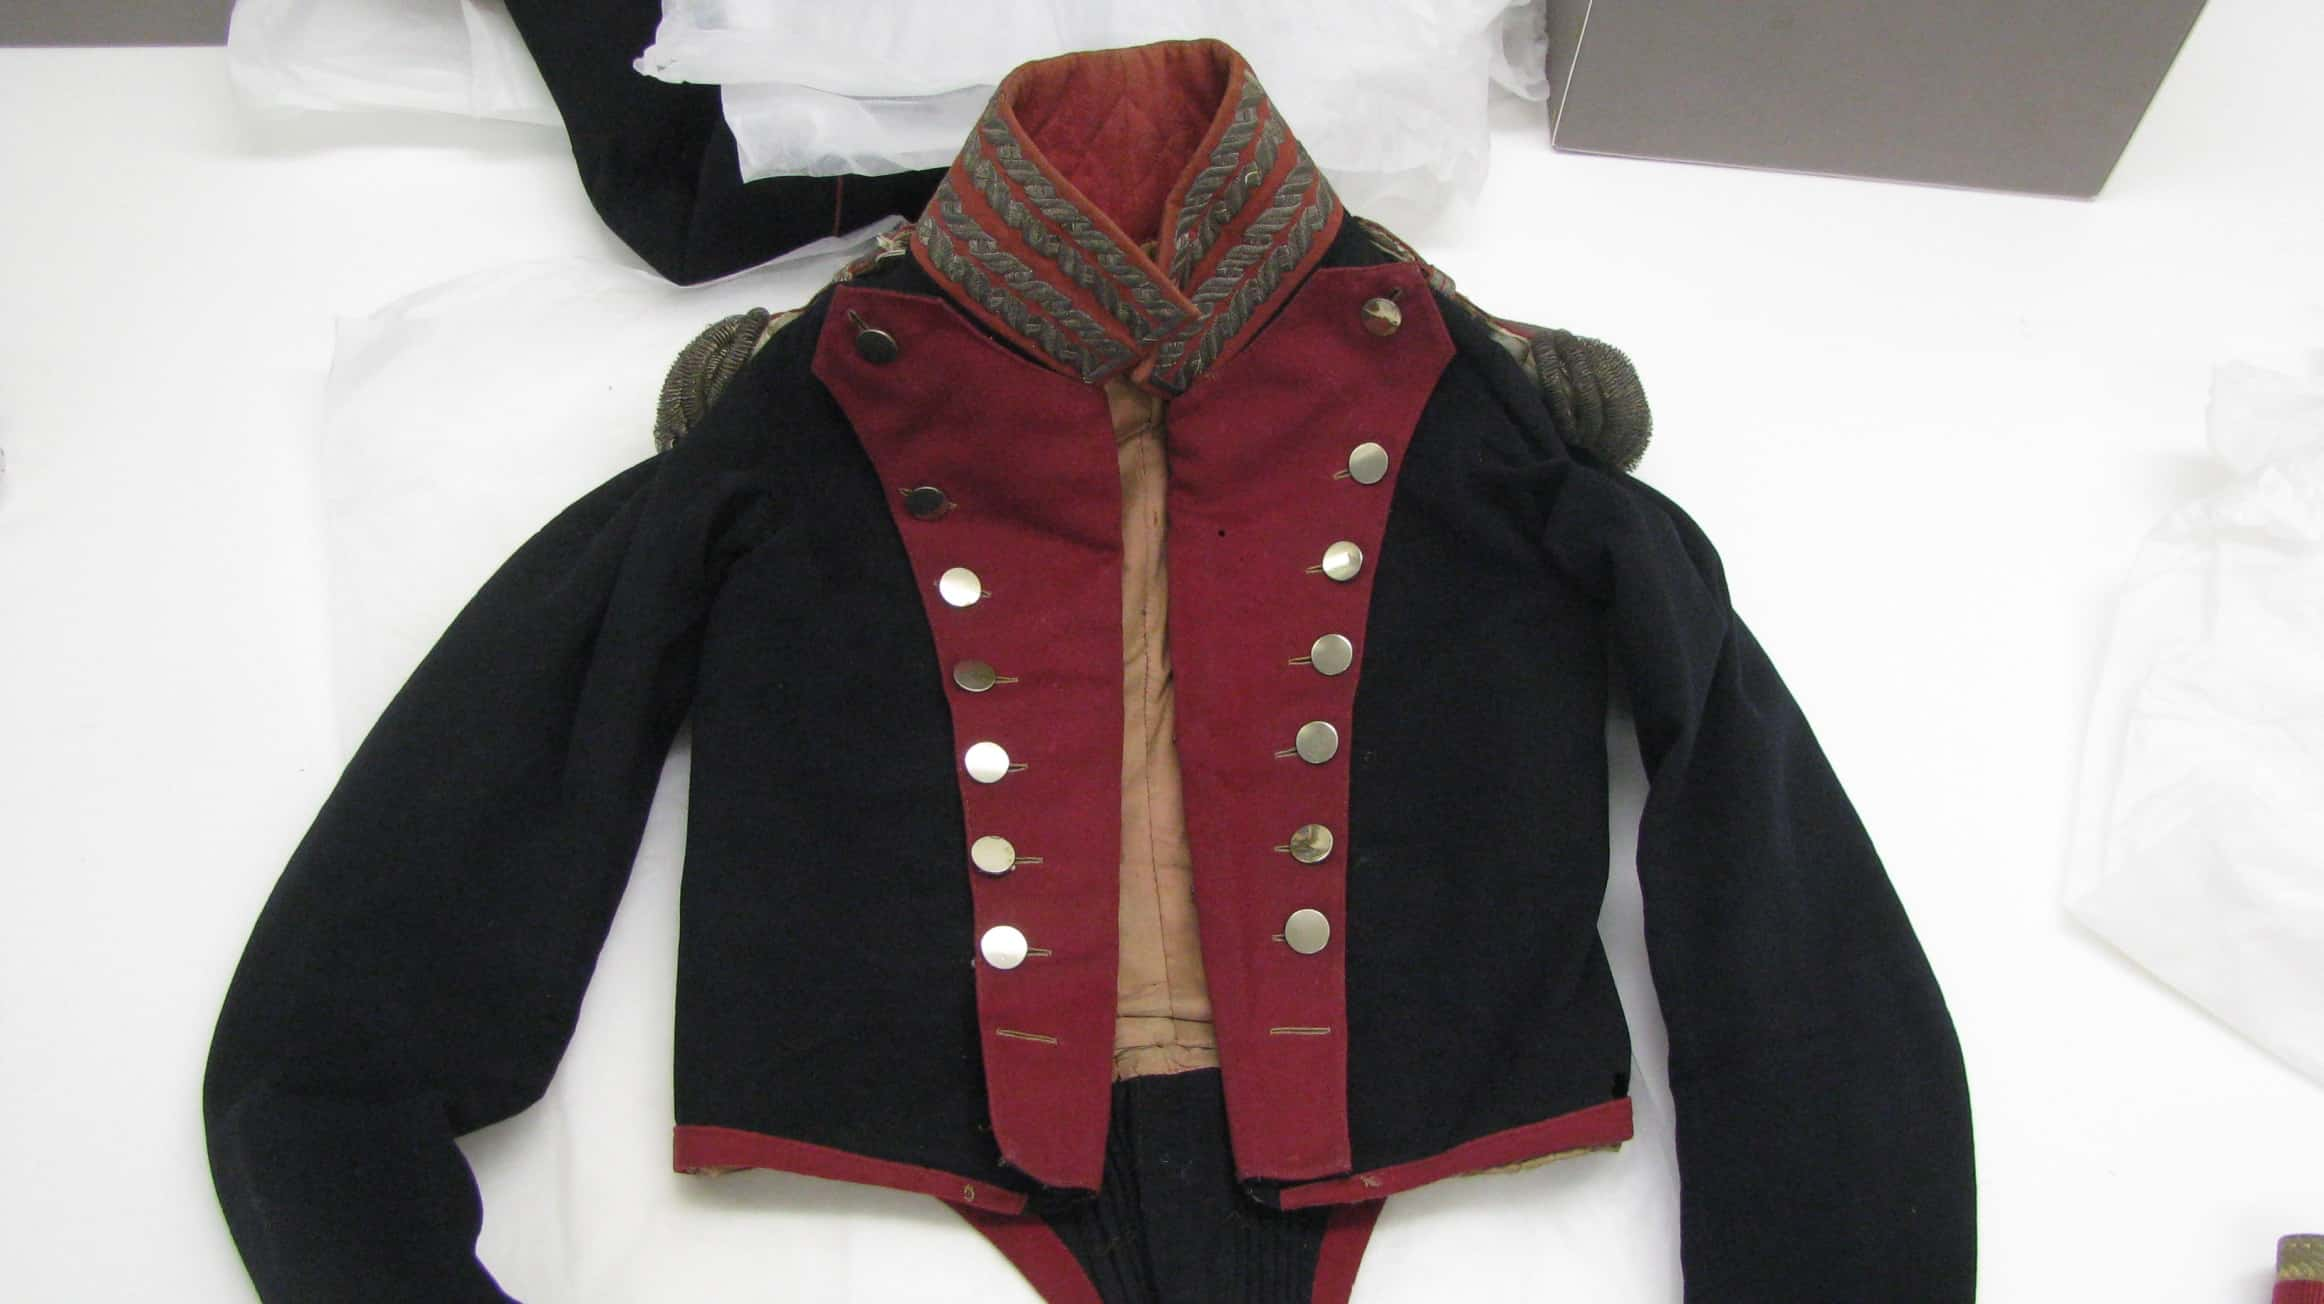 Conserved Napoleonic Uniform by Jacqueline Hyman